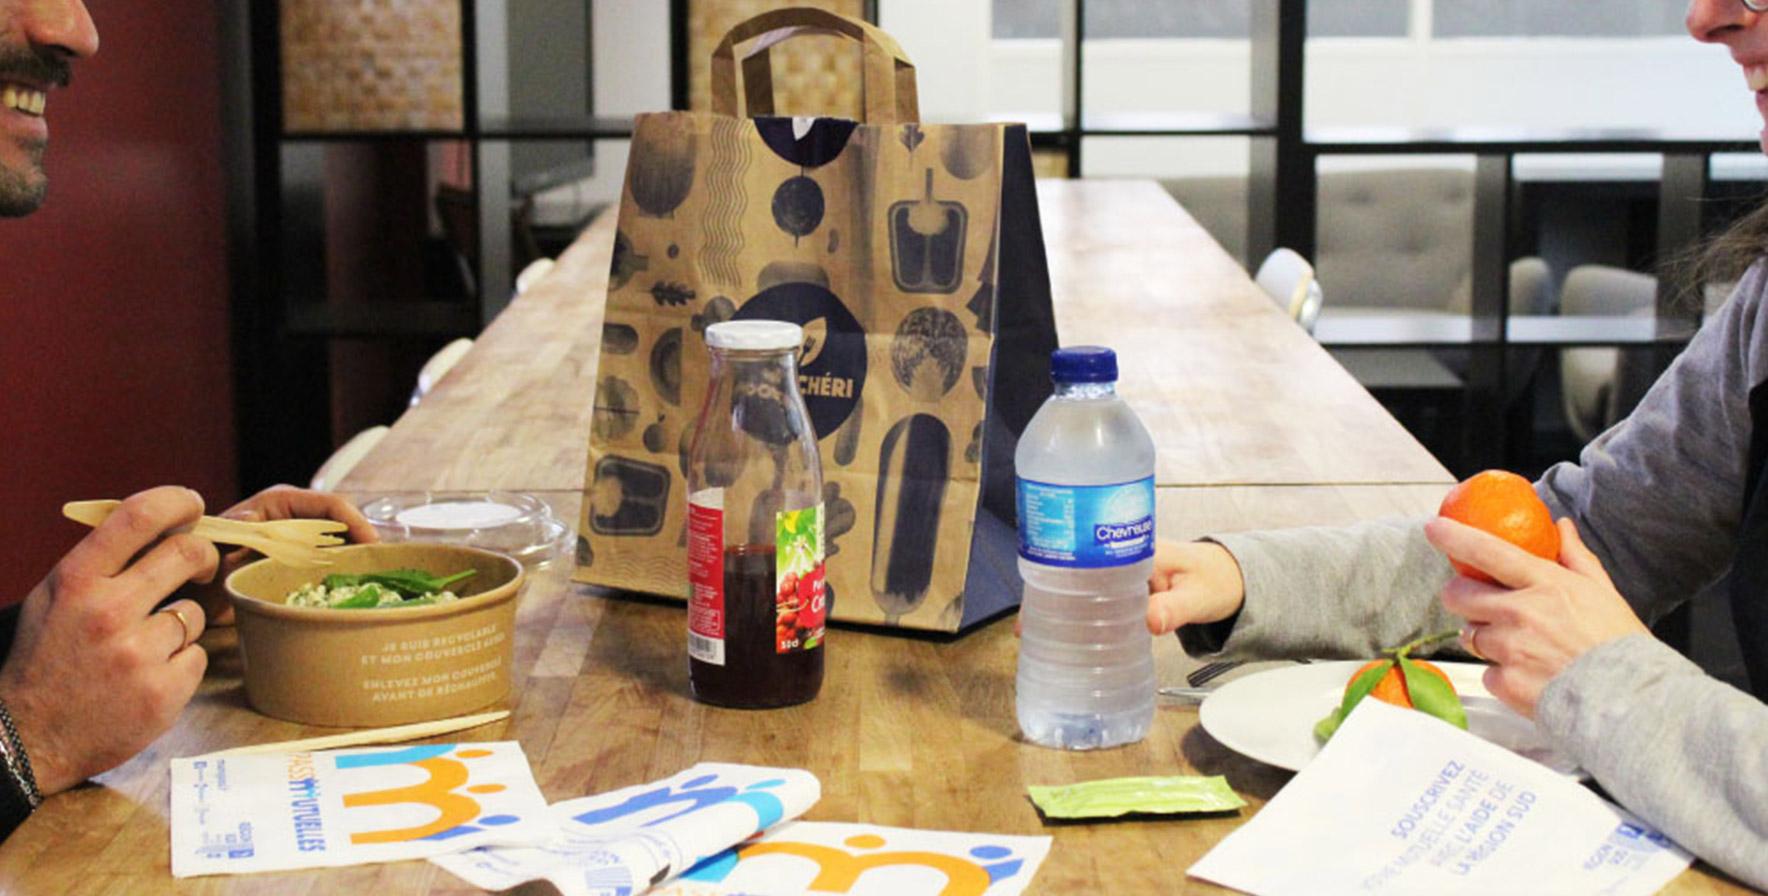 Support tactique - serviette de table - Keemia agence marketing local Atlantique